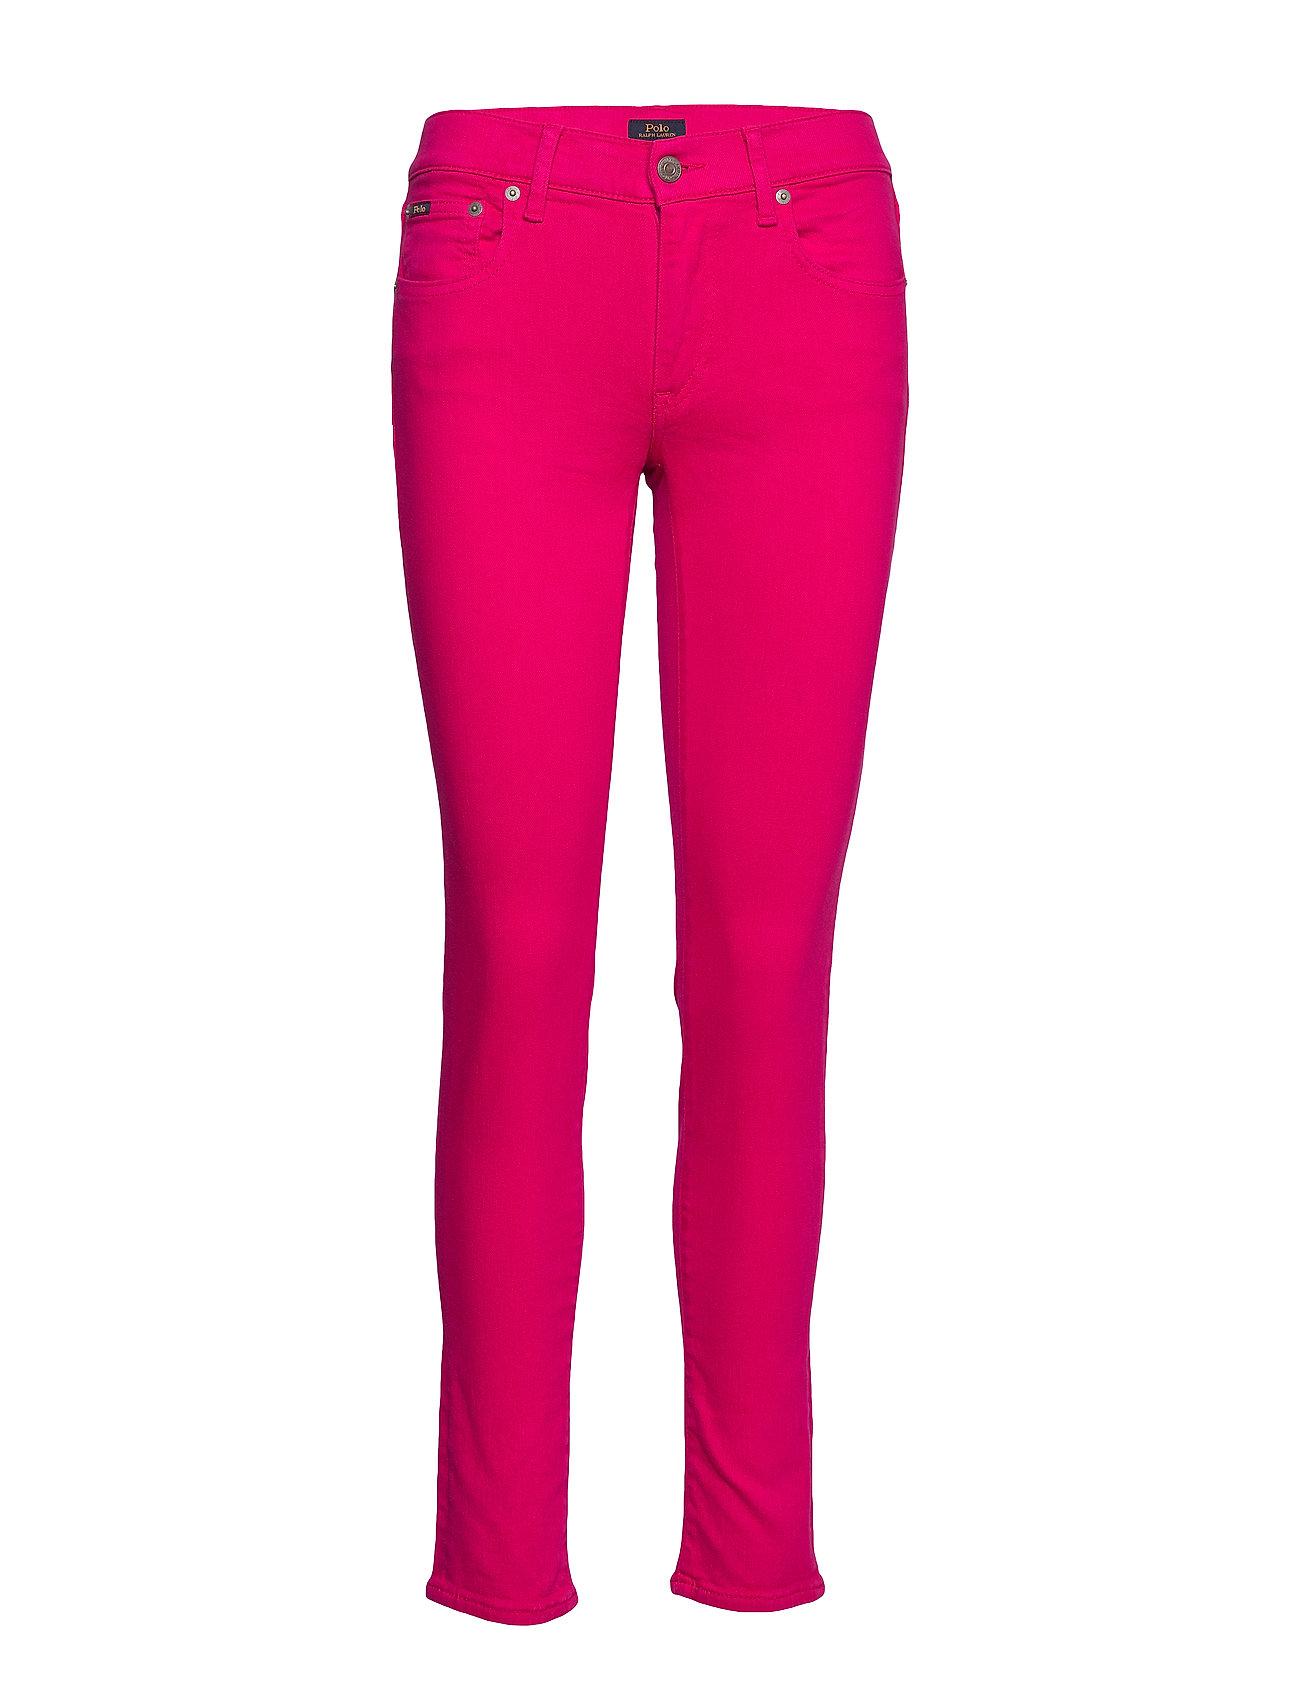 Polo Ralph Lauren Tompkins Stretch Skinny Jean - FUSCHIA